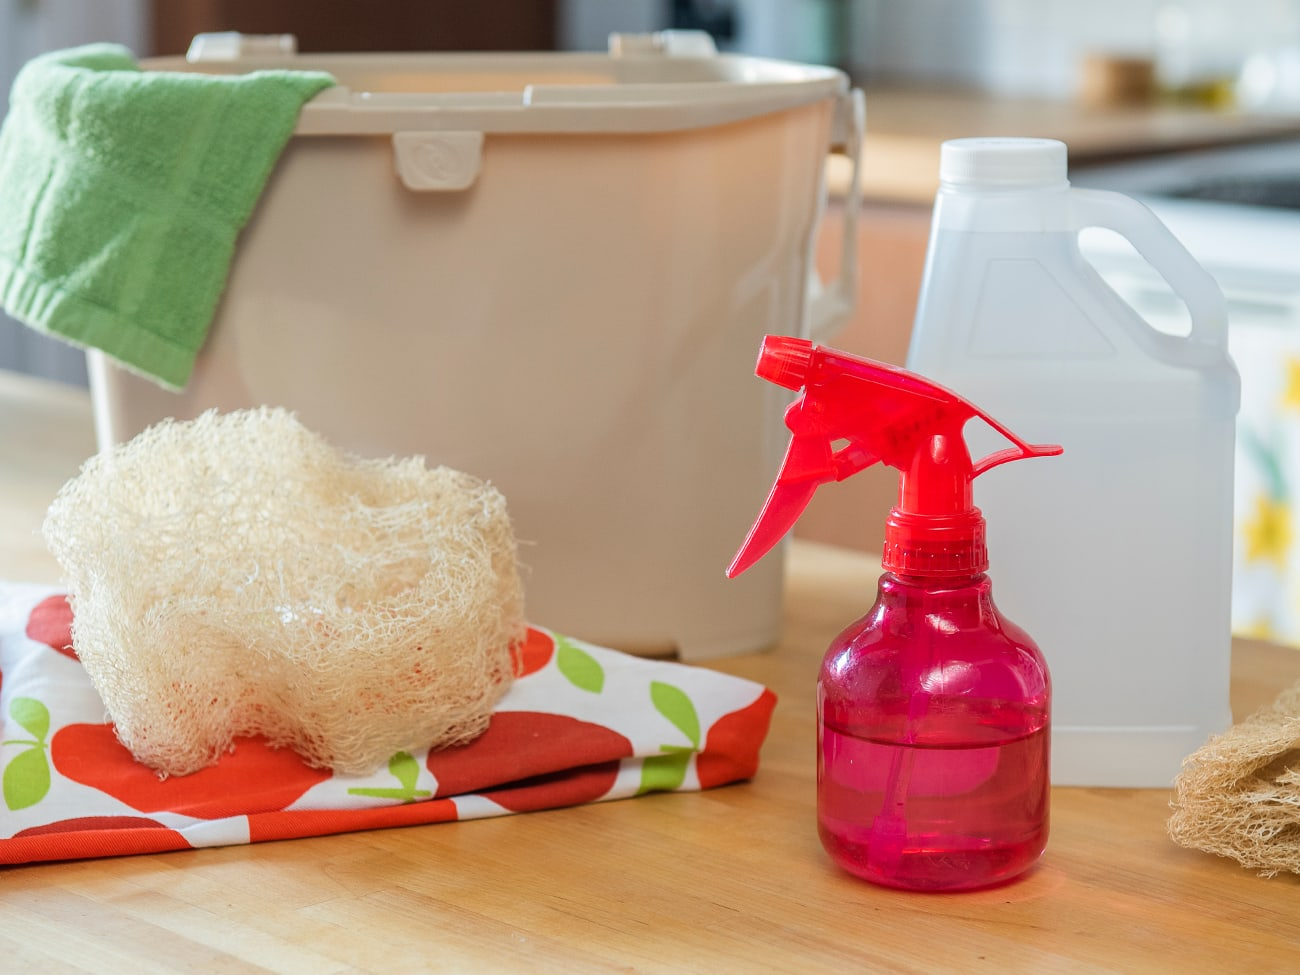 Nettoyer régulièrement son bac avec du vinaigre